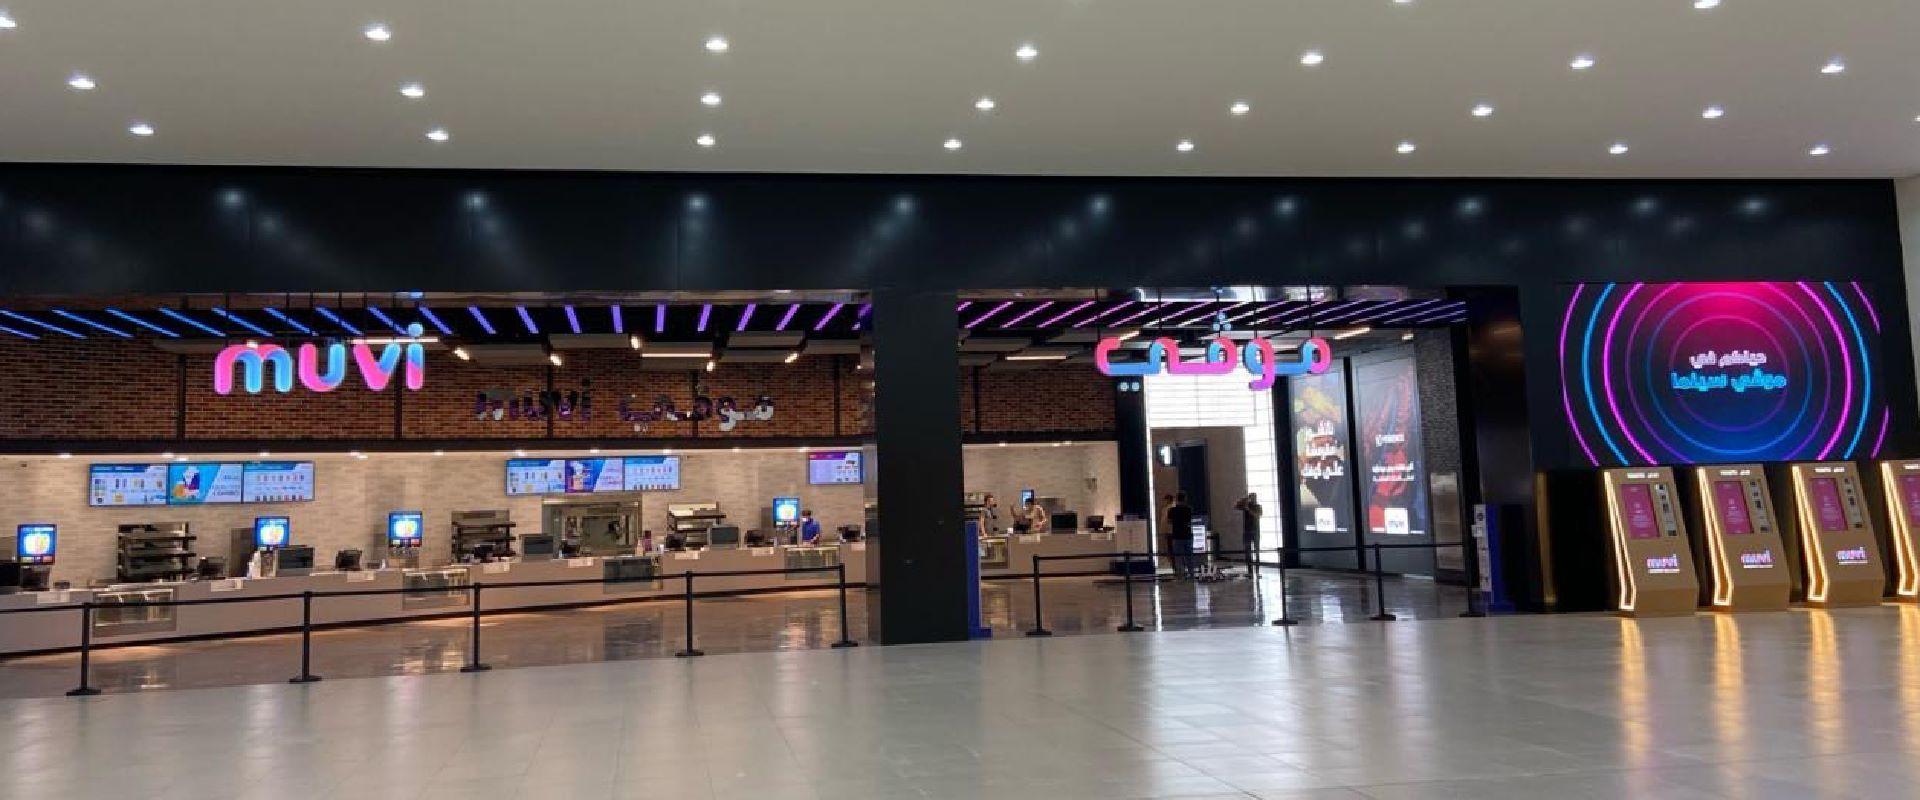 Al Ahsa Mall Hofuf Book Movie Tickets Muvi Cinemas Ksa